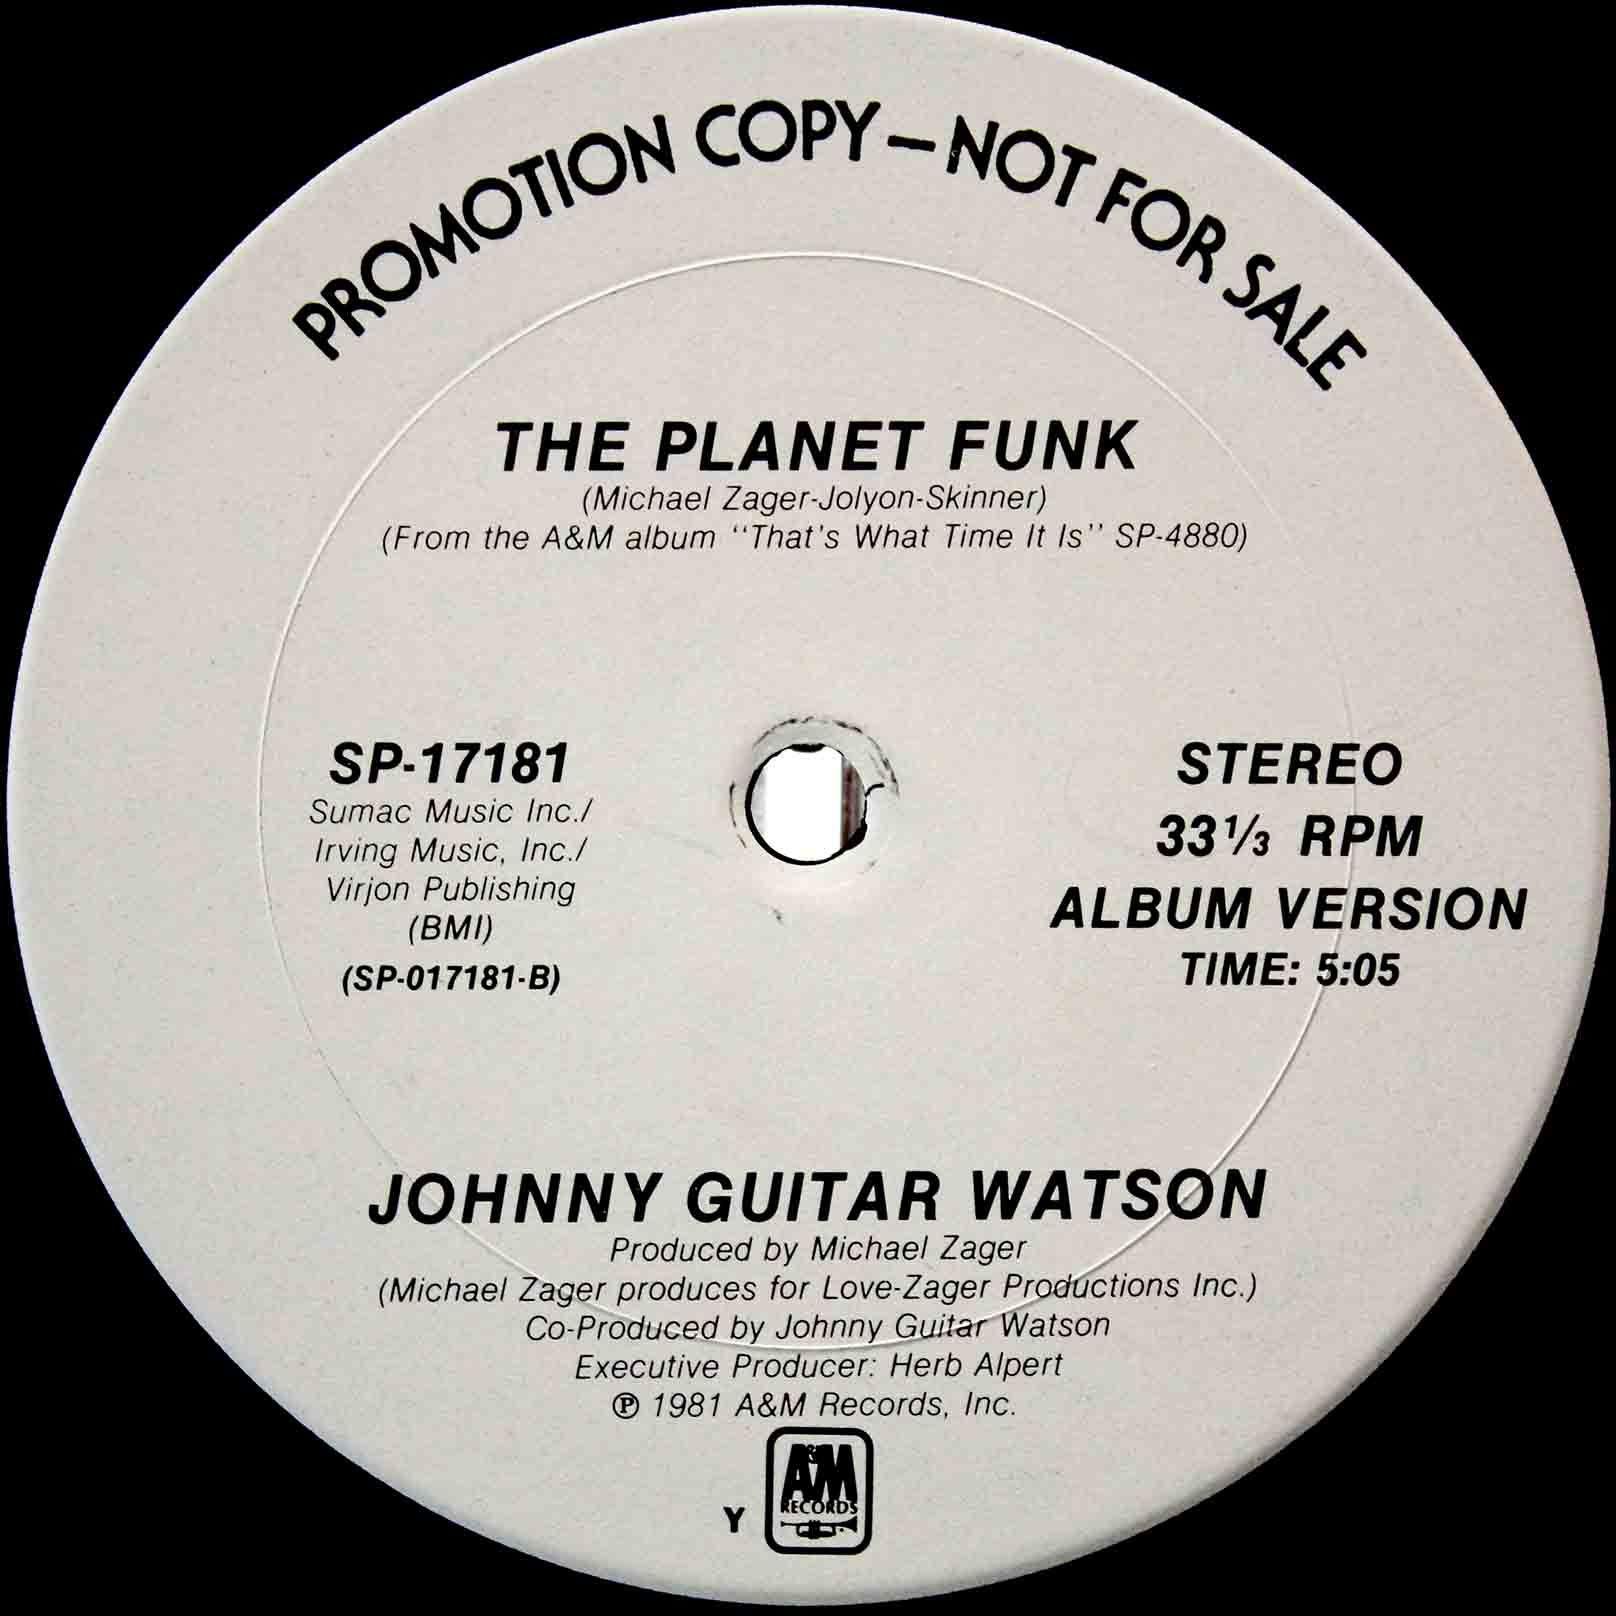 Johnny Guitar Watson – The Planet Funk 03